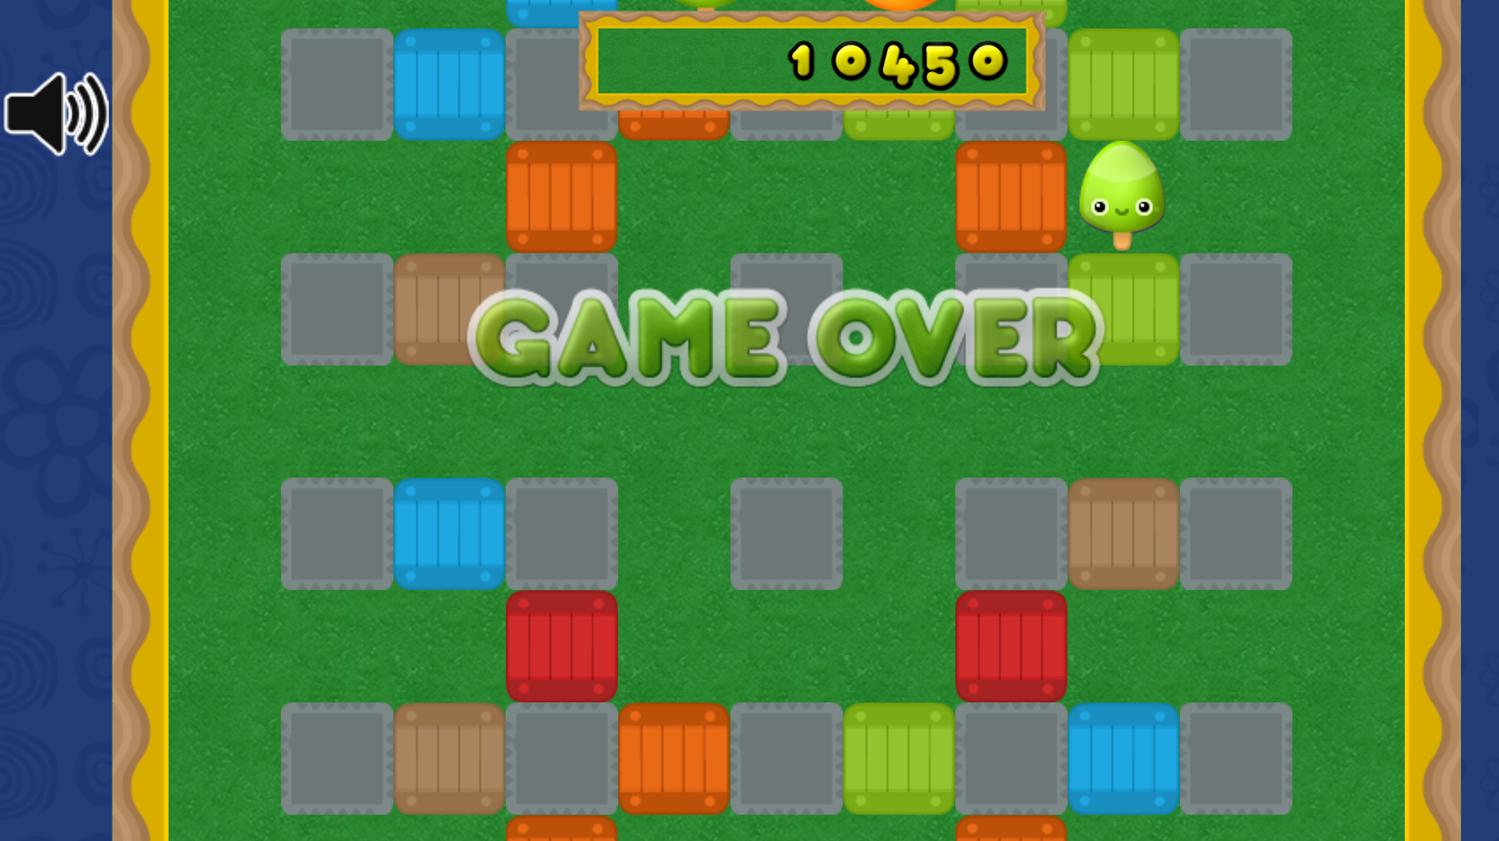 Super Balloon Bomb Game Over Screenshot.